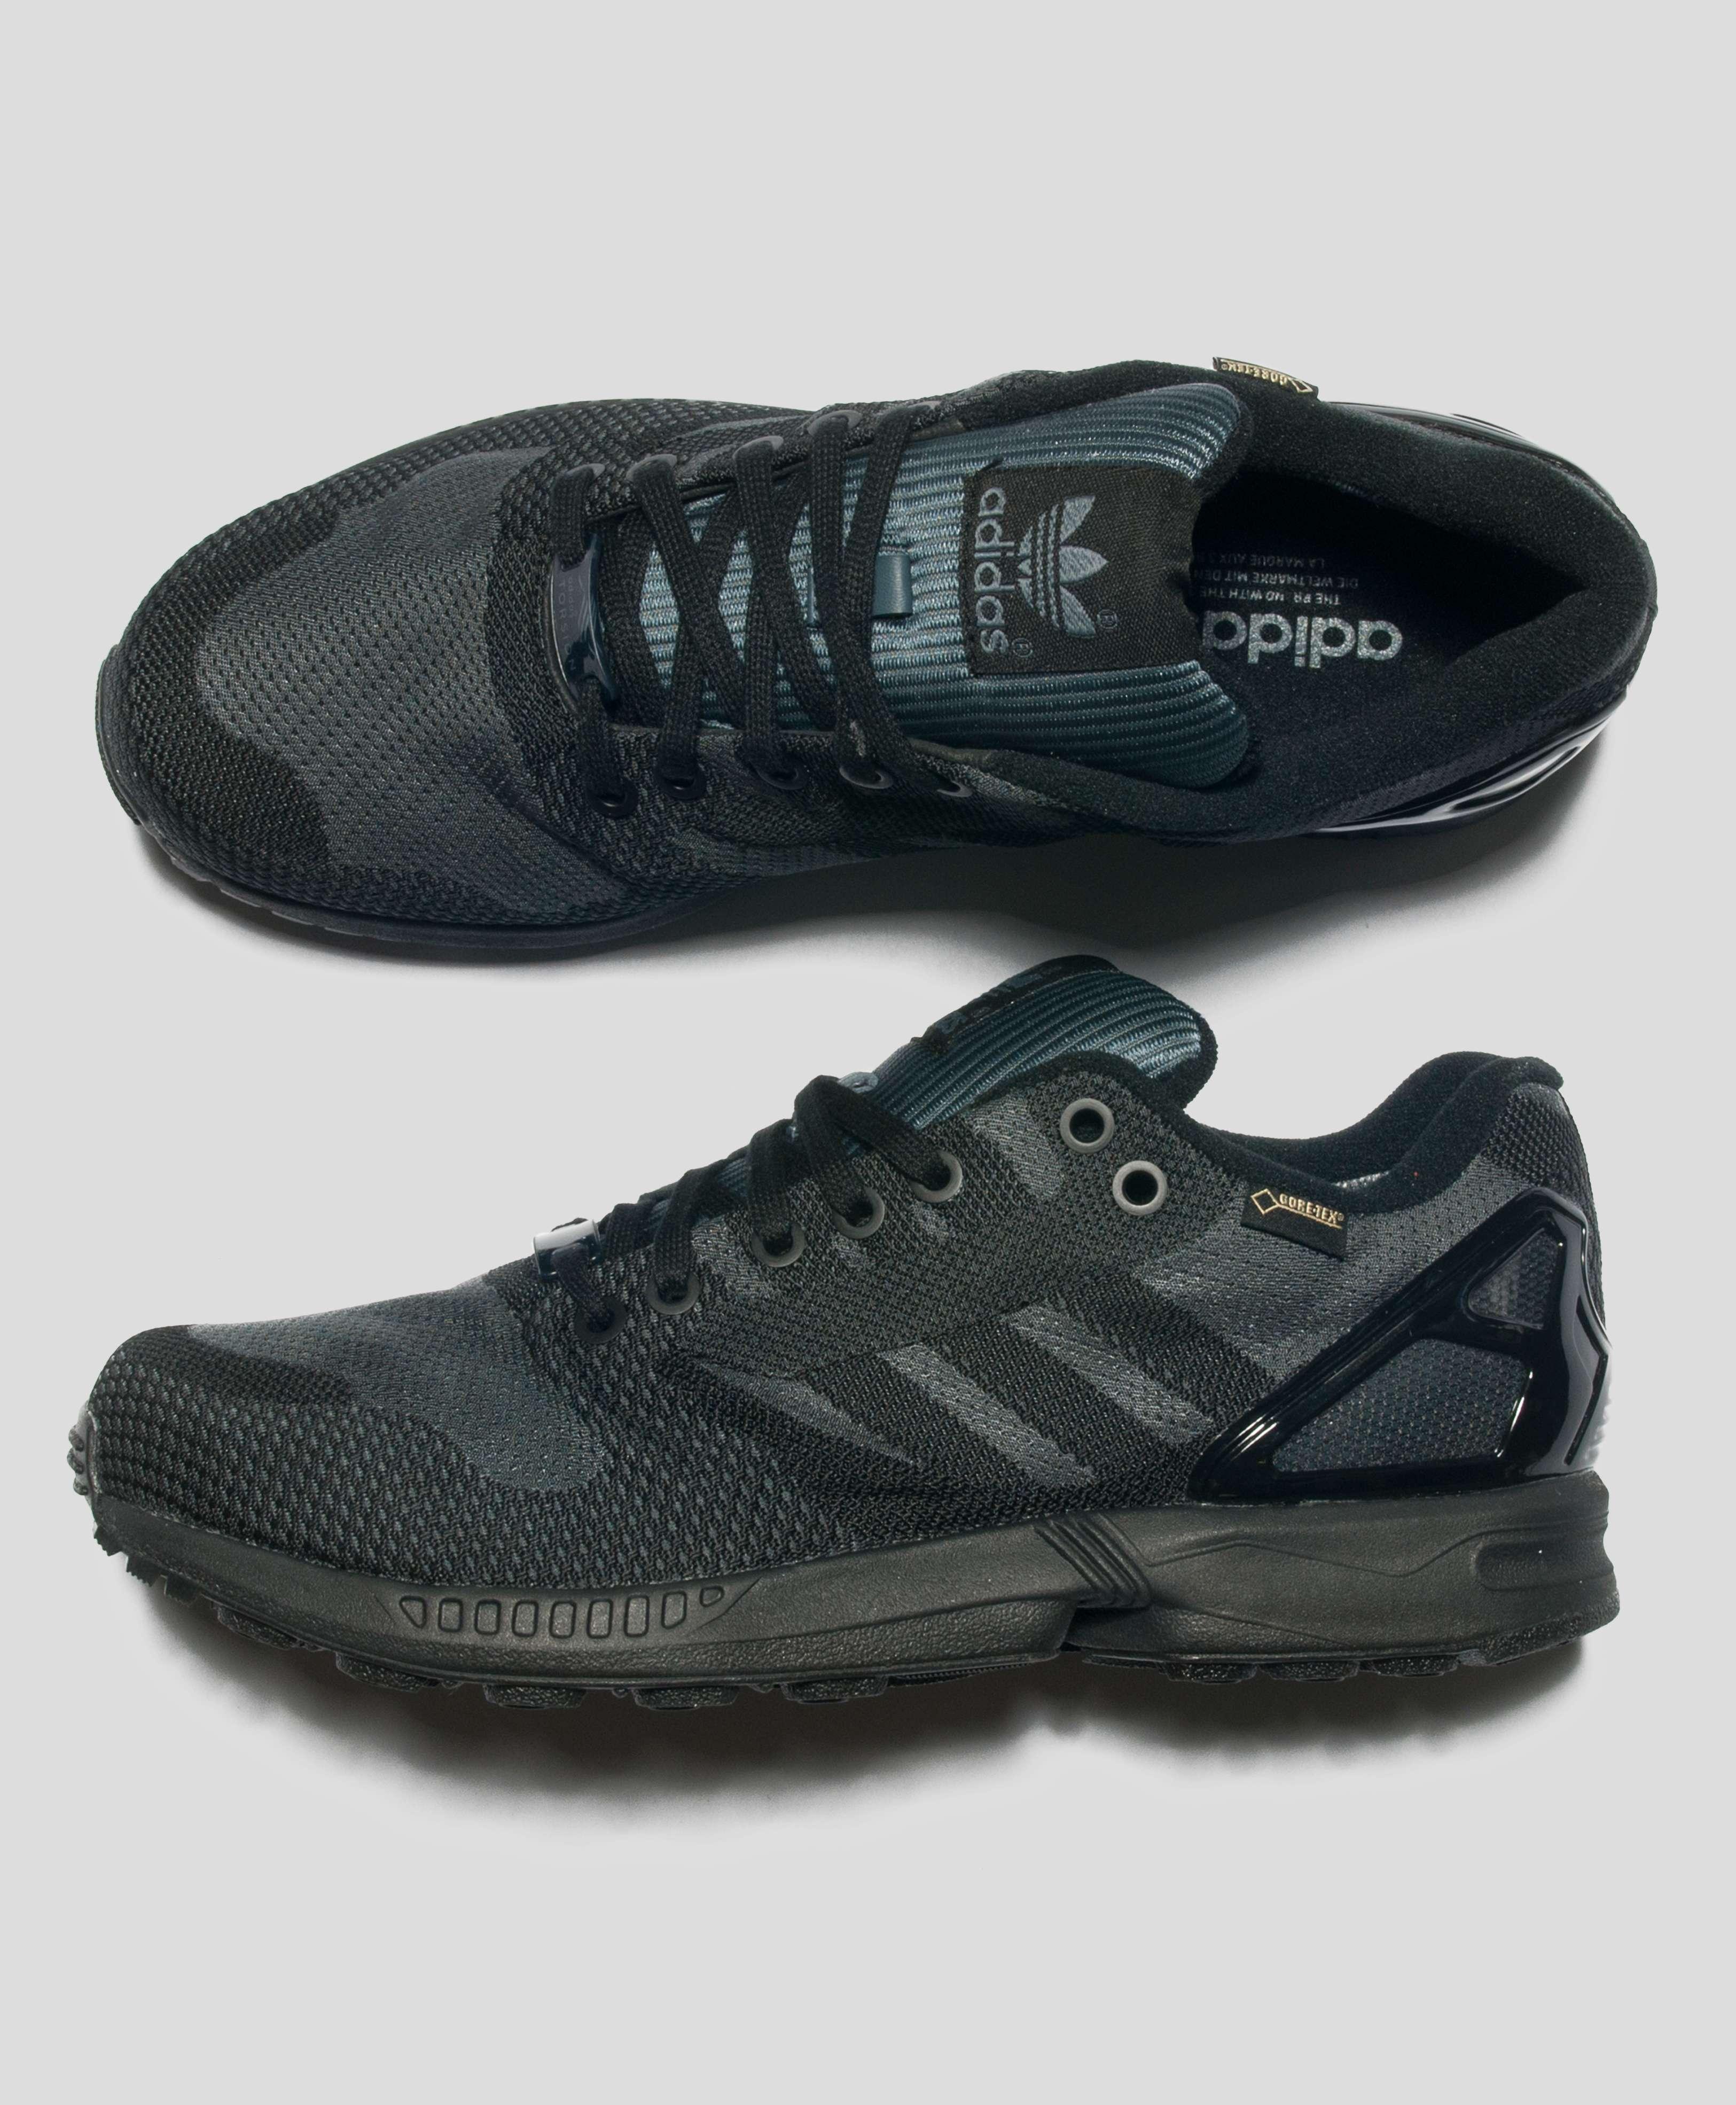 on sale ea6b2 20bb2 adidas Originals ZX Flux Weave OG | scotts Menswear